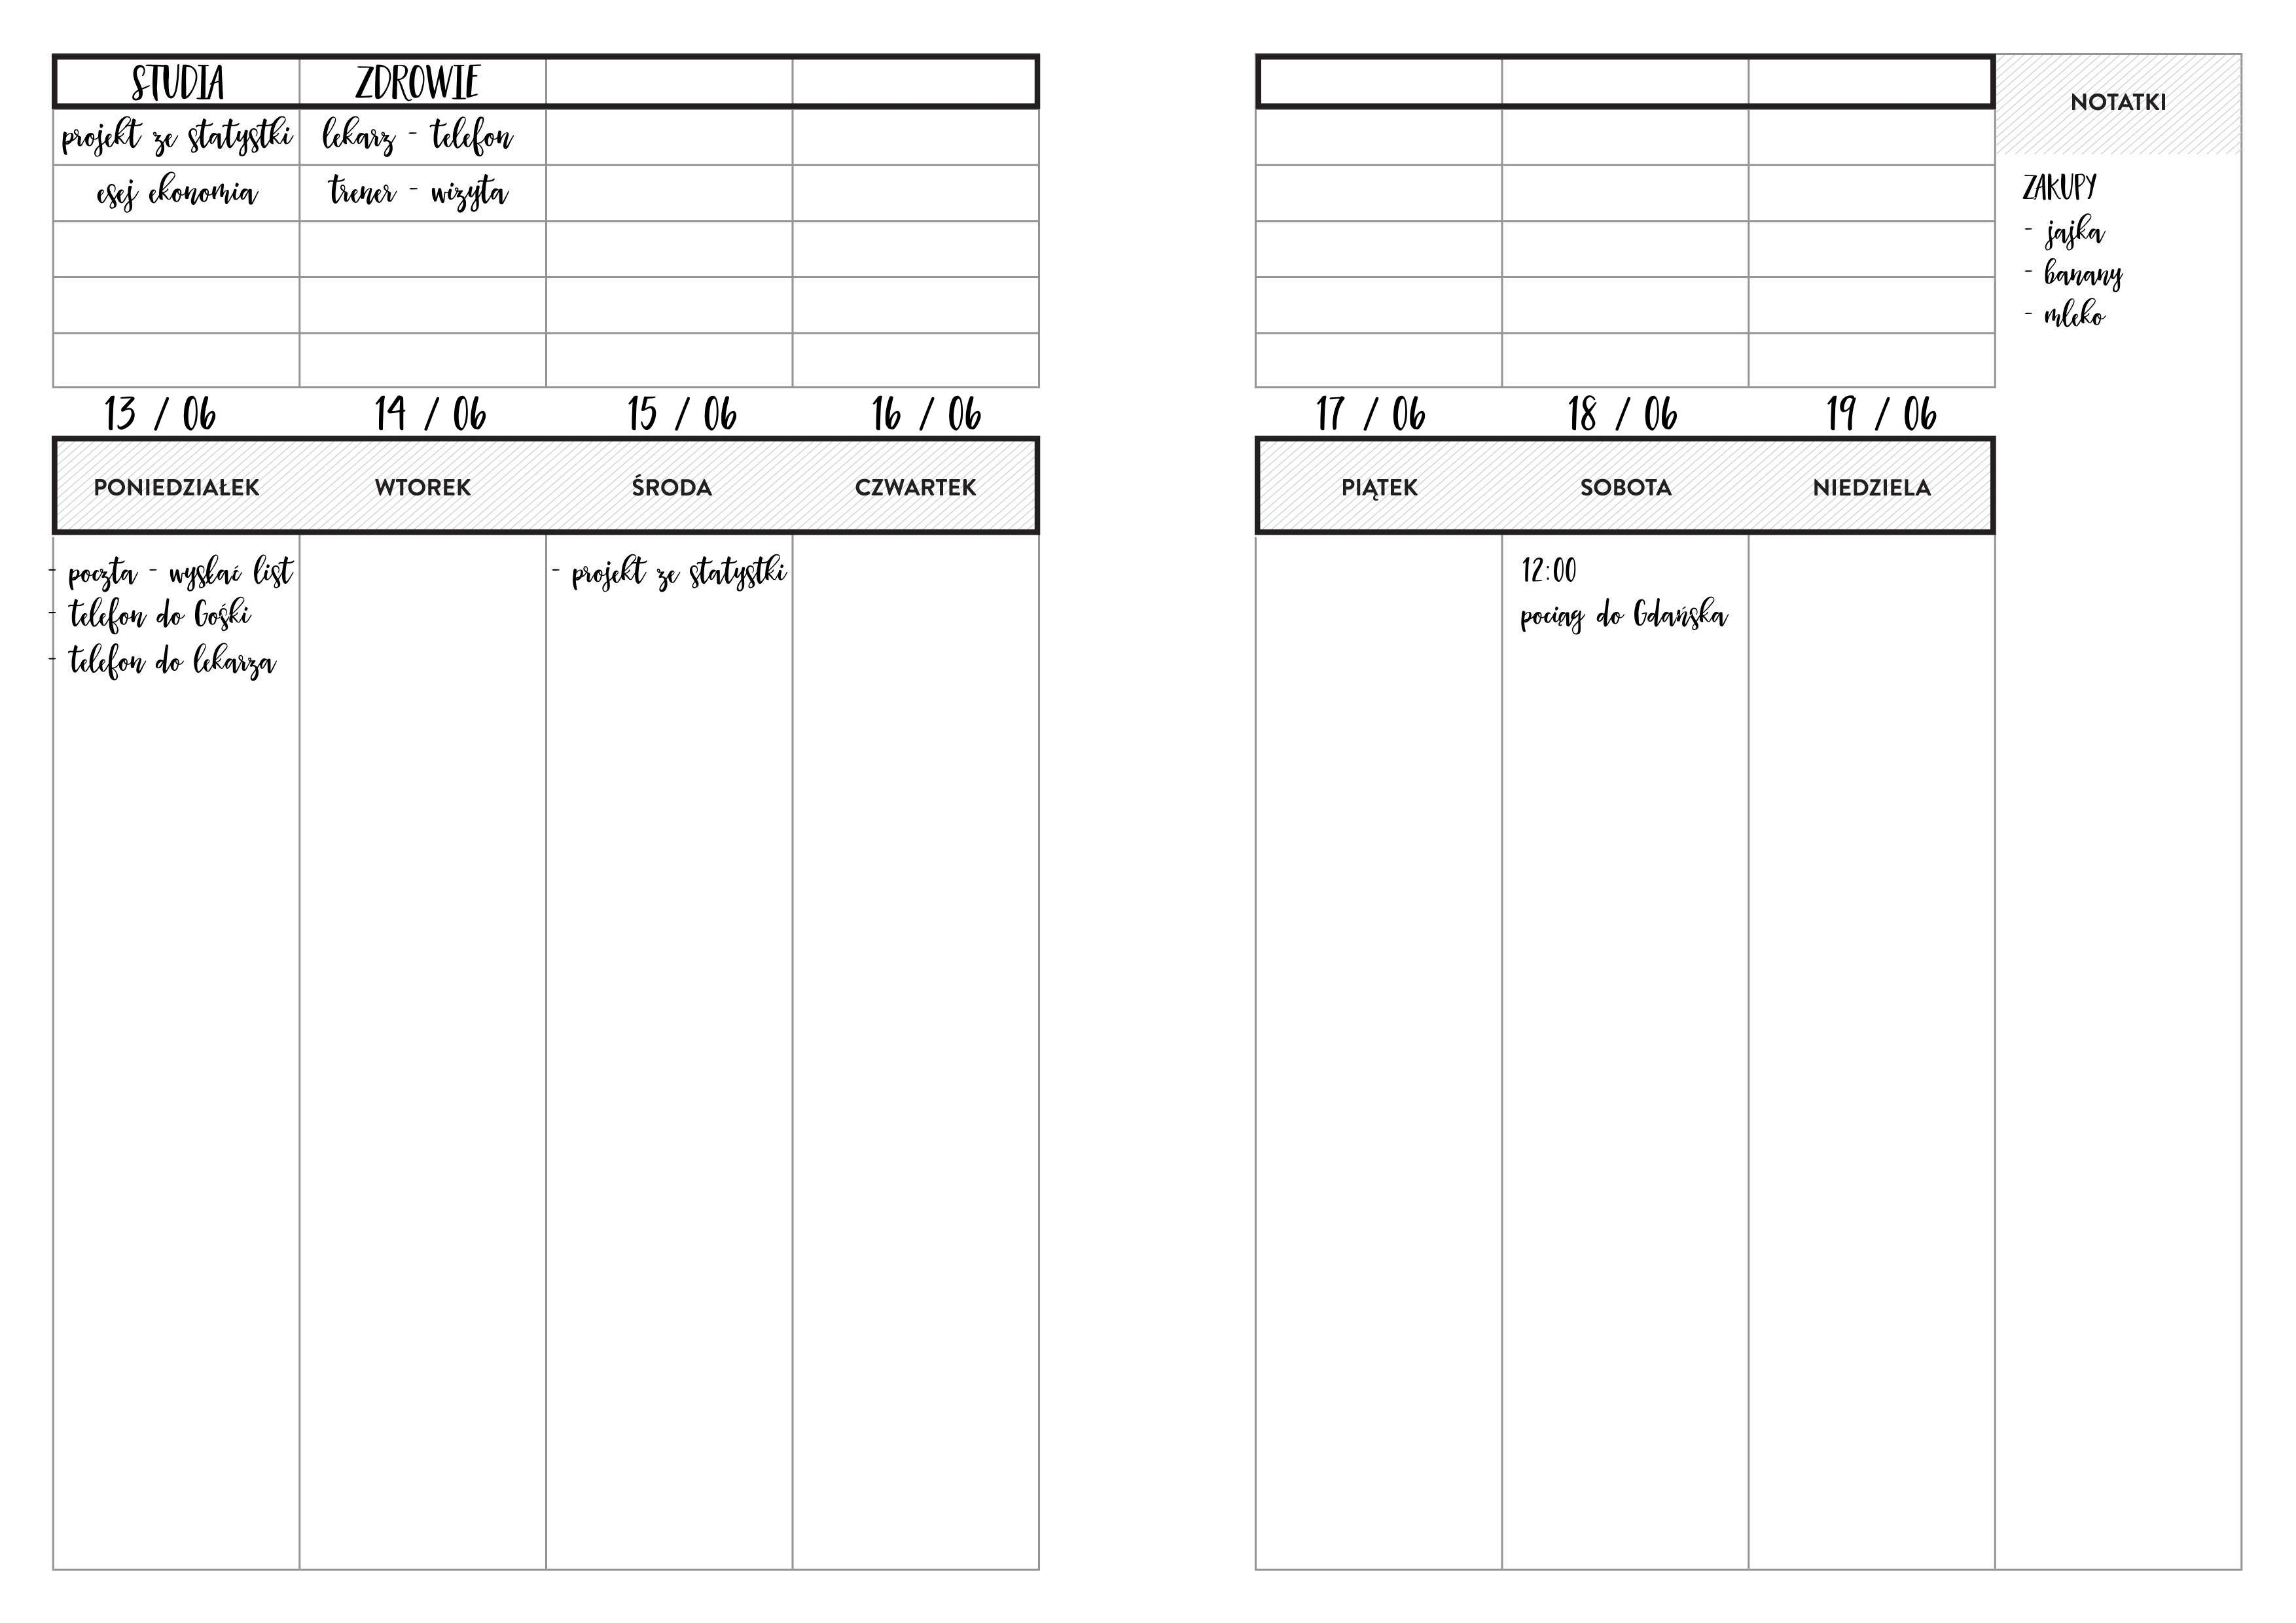 Planer Tygodniowy A4Planer Tygodniowy A4 Przykład